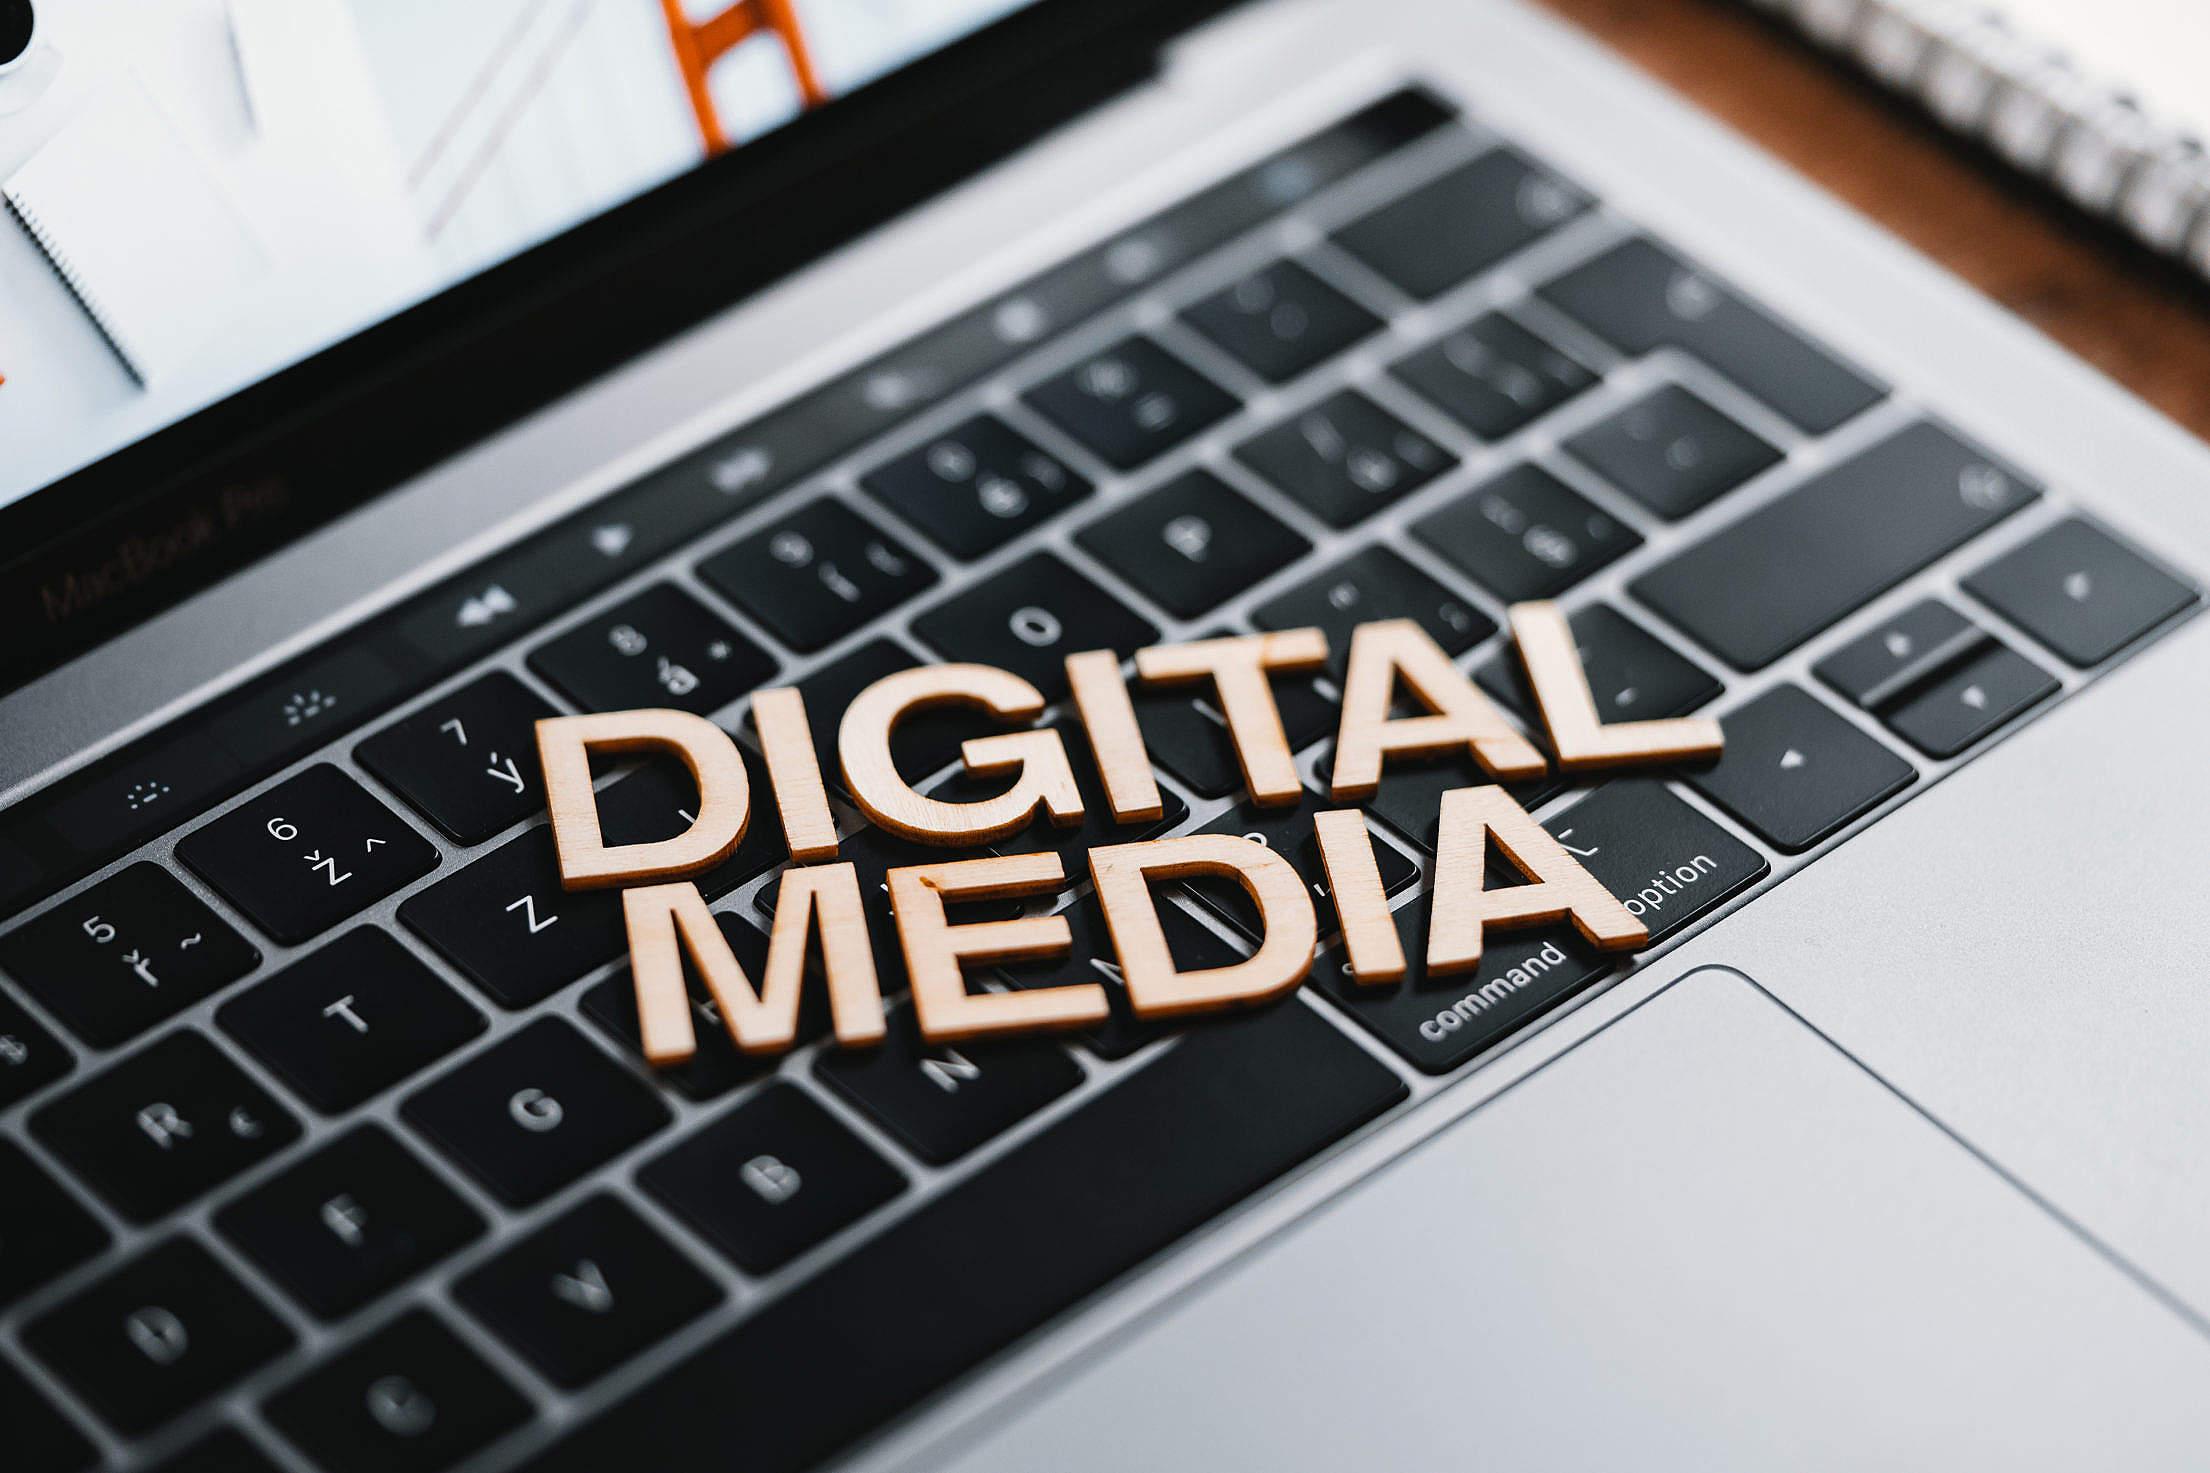 Digital Media Industry Free Stock Photo